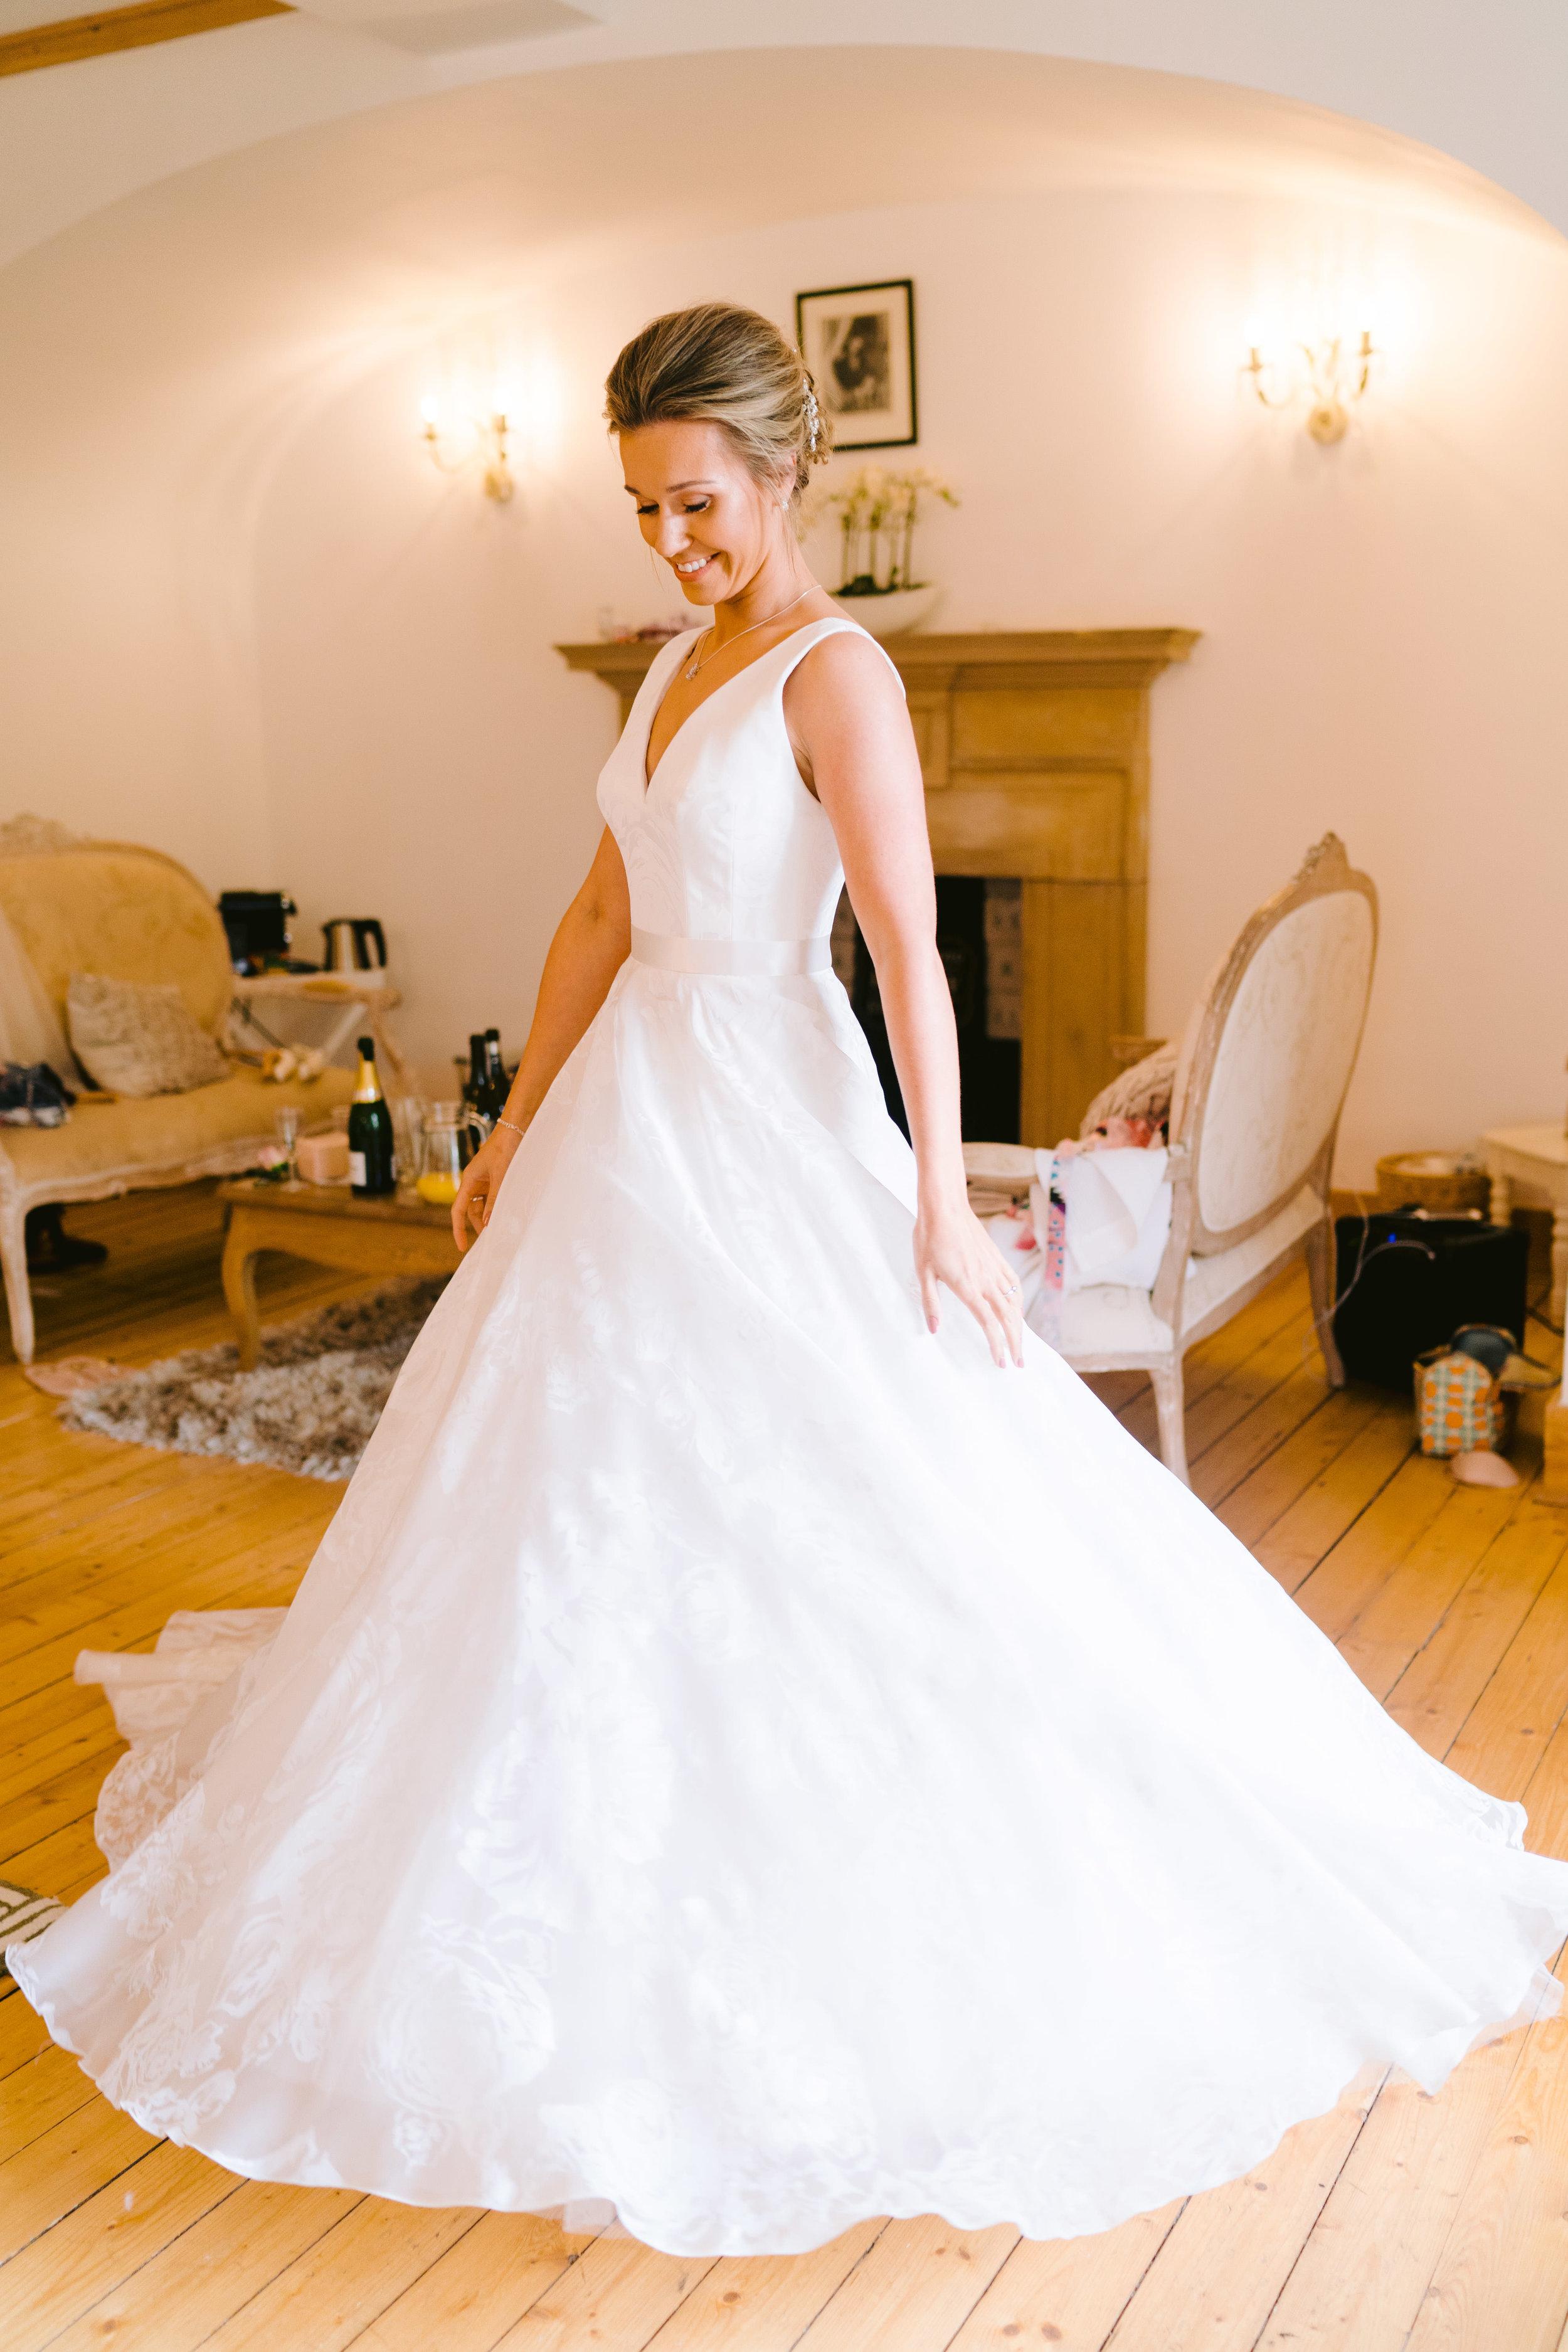 Karin_and_Shauns_Wedding_-_Achnagairn_Castle_-_www.eilidhrobertson.co.uk-242.jpg